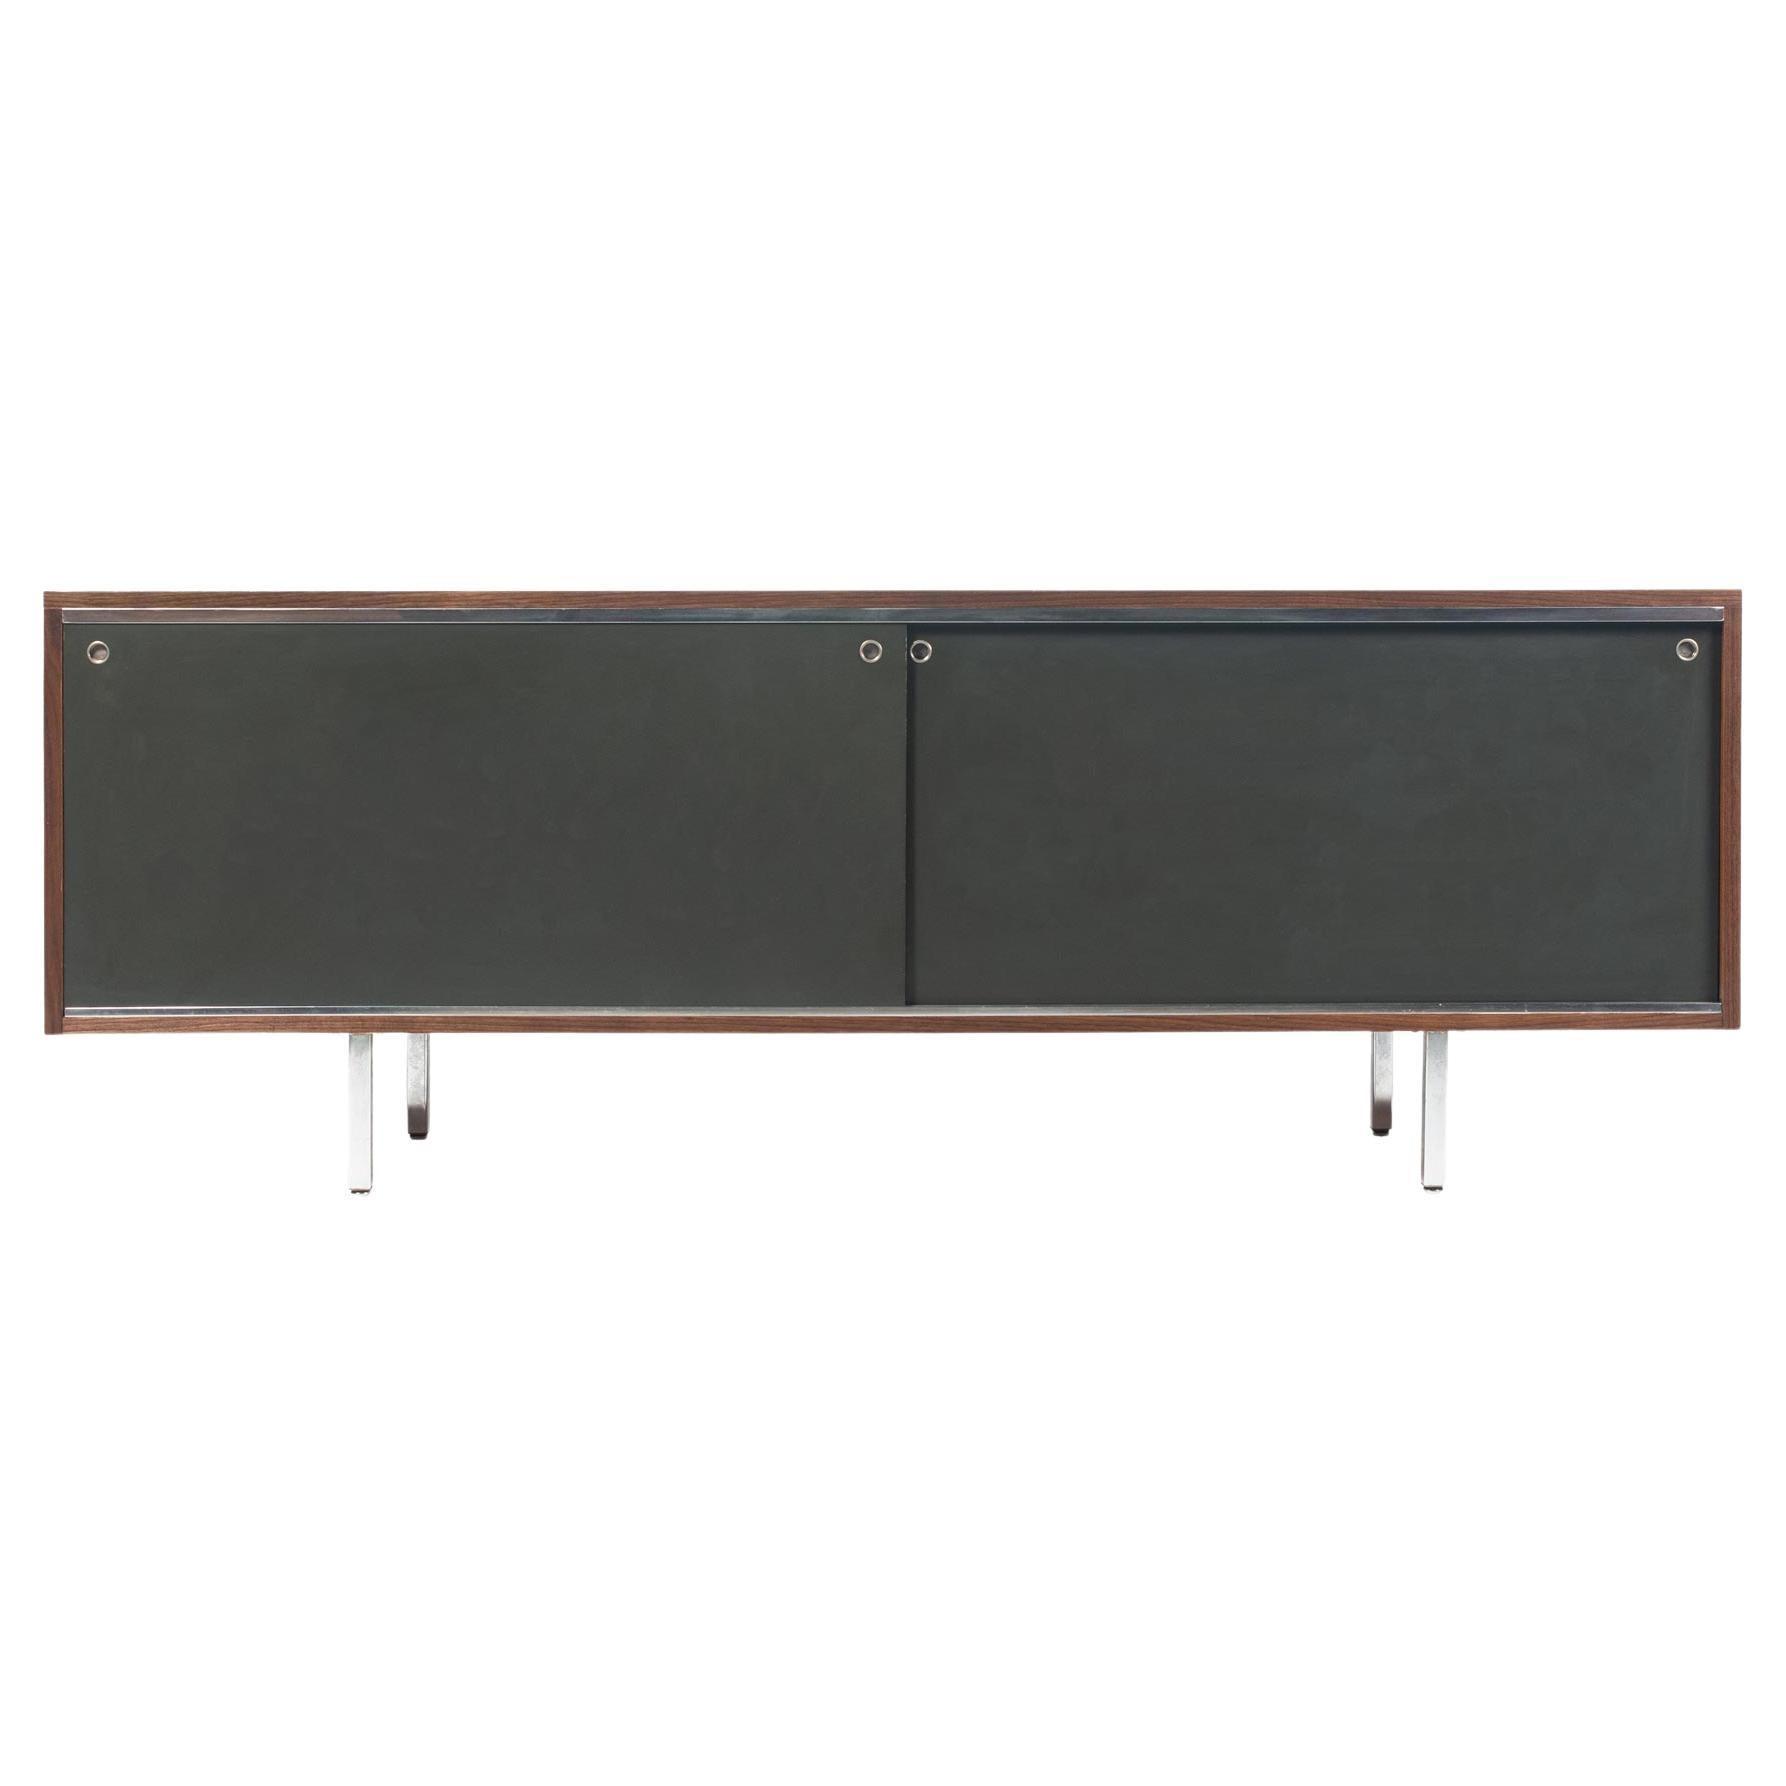 George Nelson EOG 8000 Series Sliding Door Cabinet in Walnut